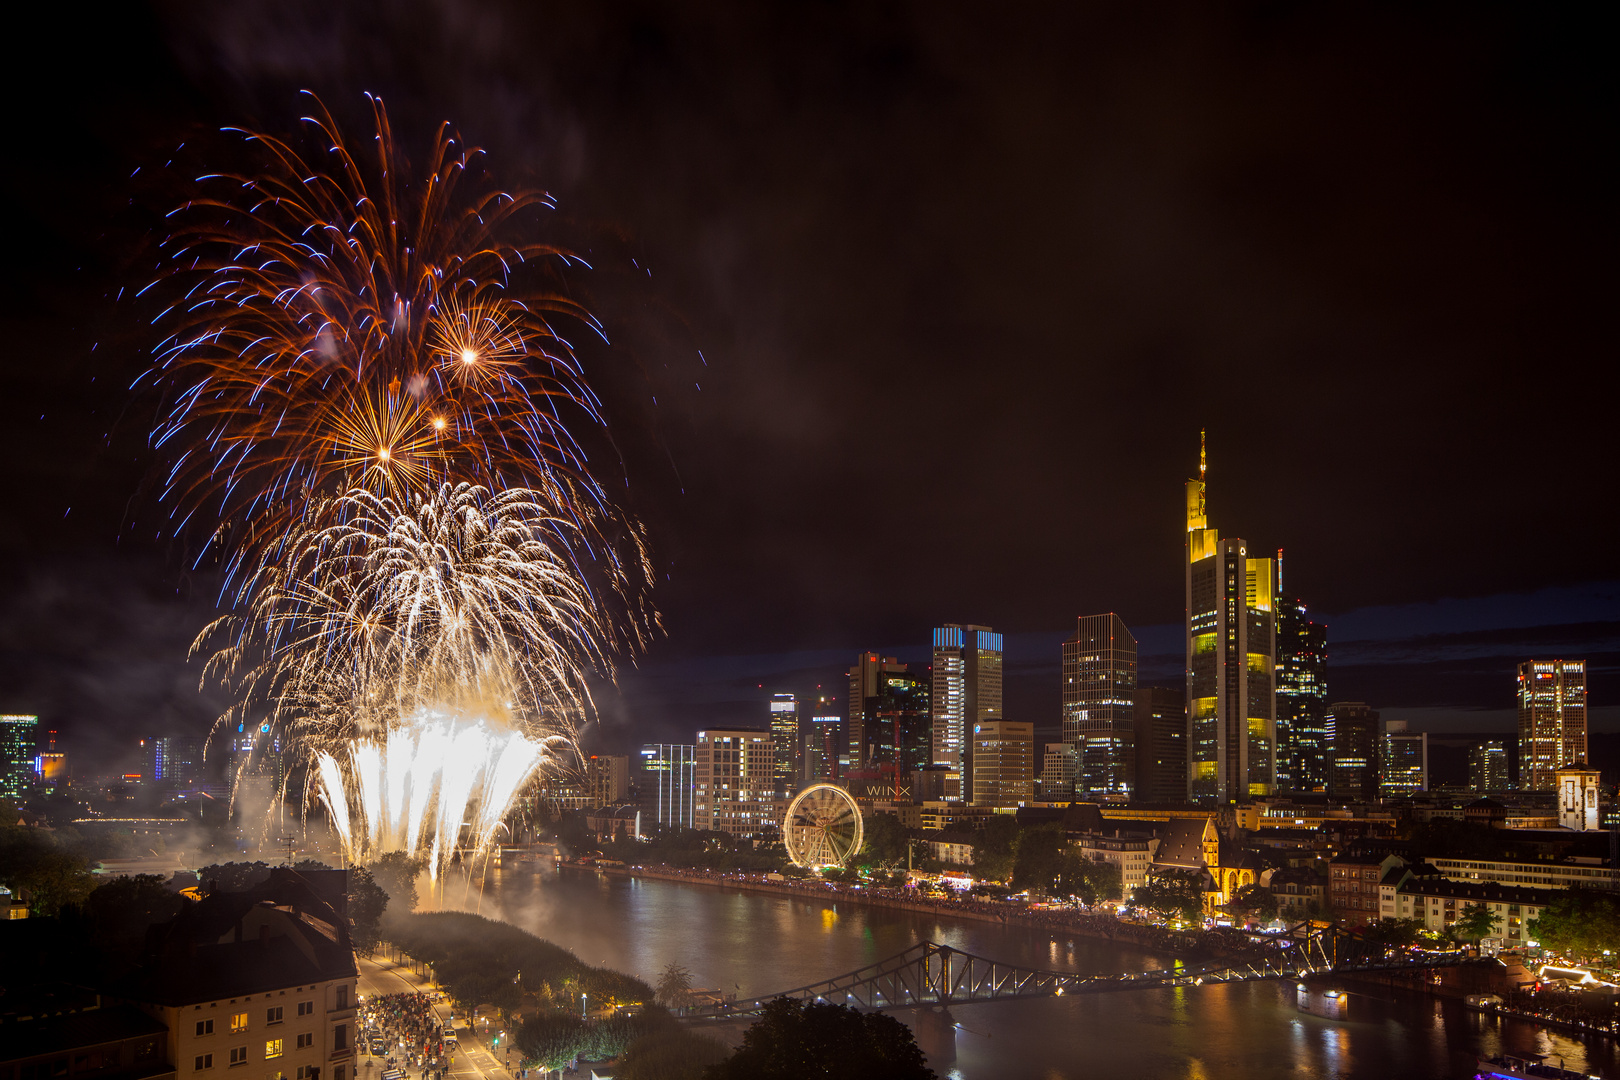 Mainfest Fireworks